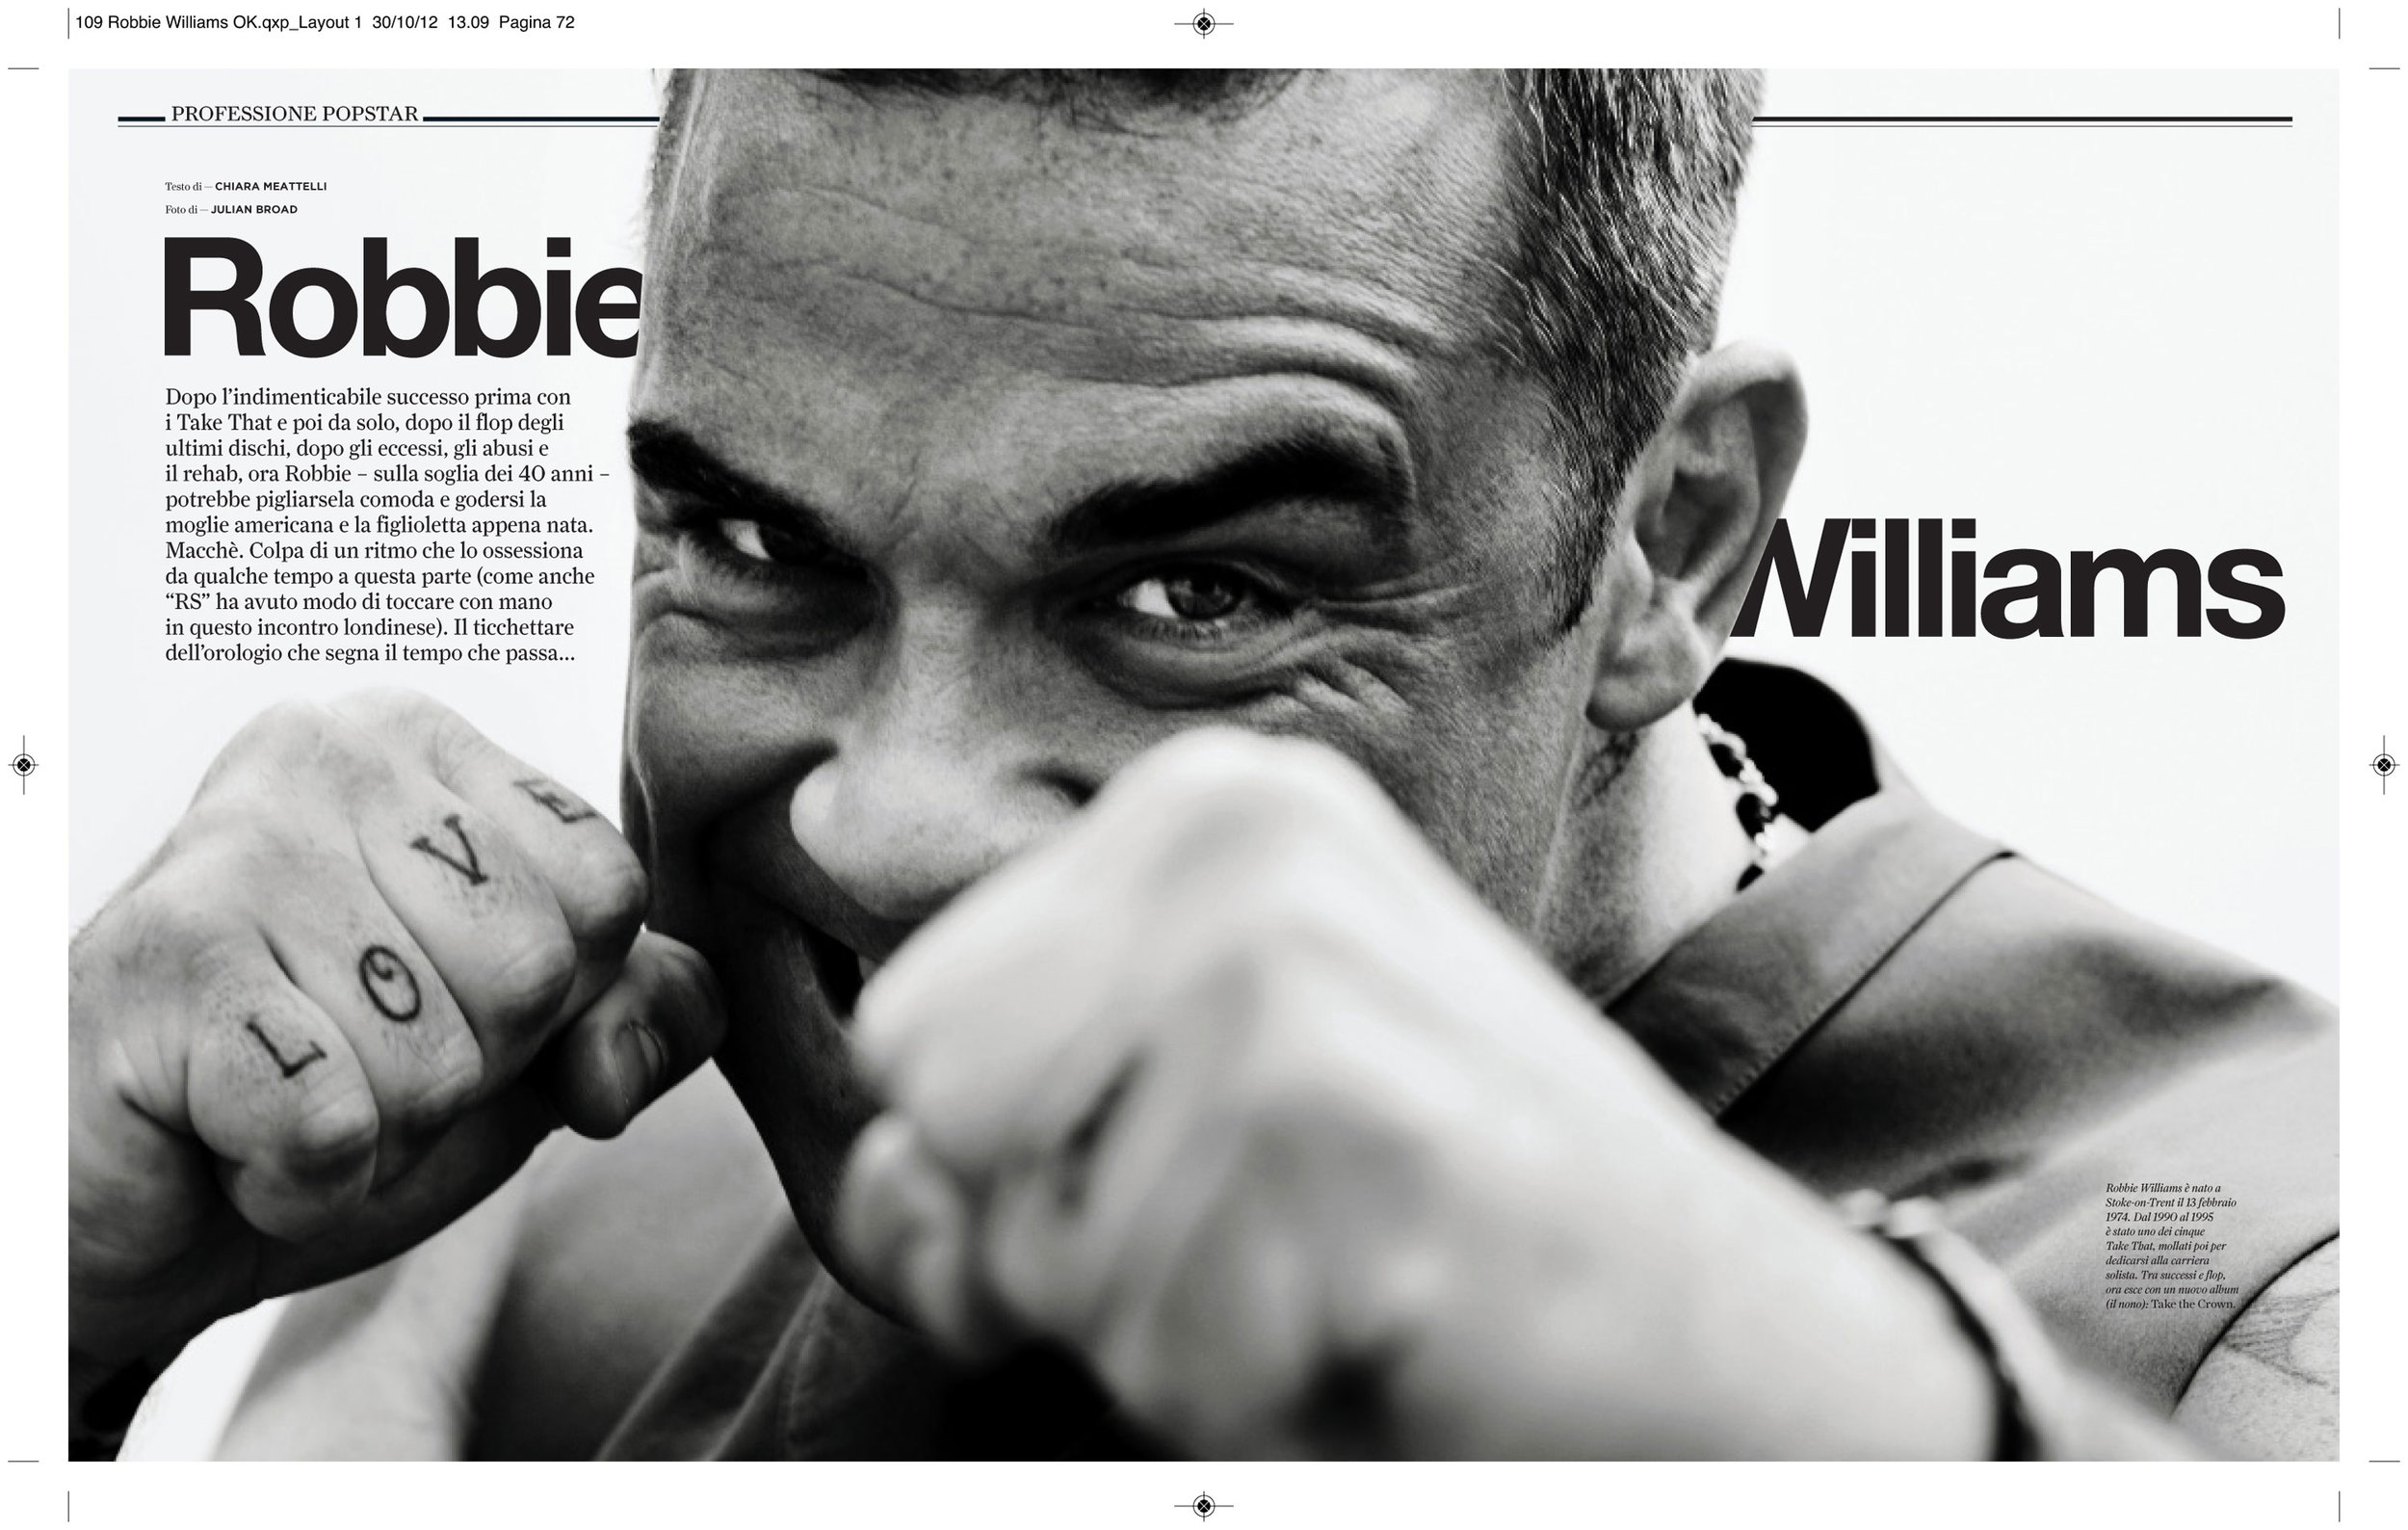 Rolling Stone magazine: Robbie Williams interview